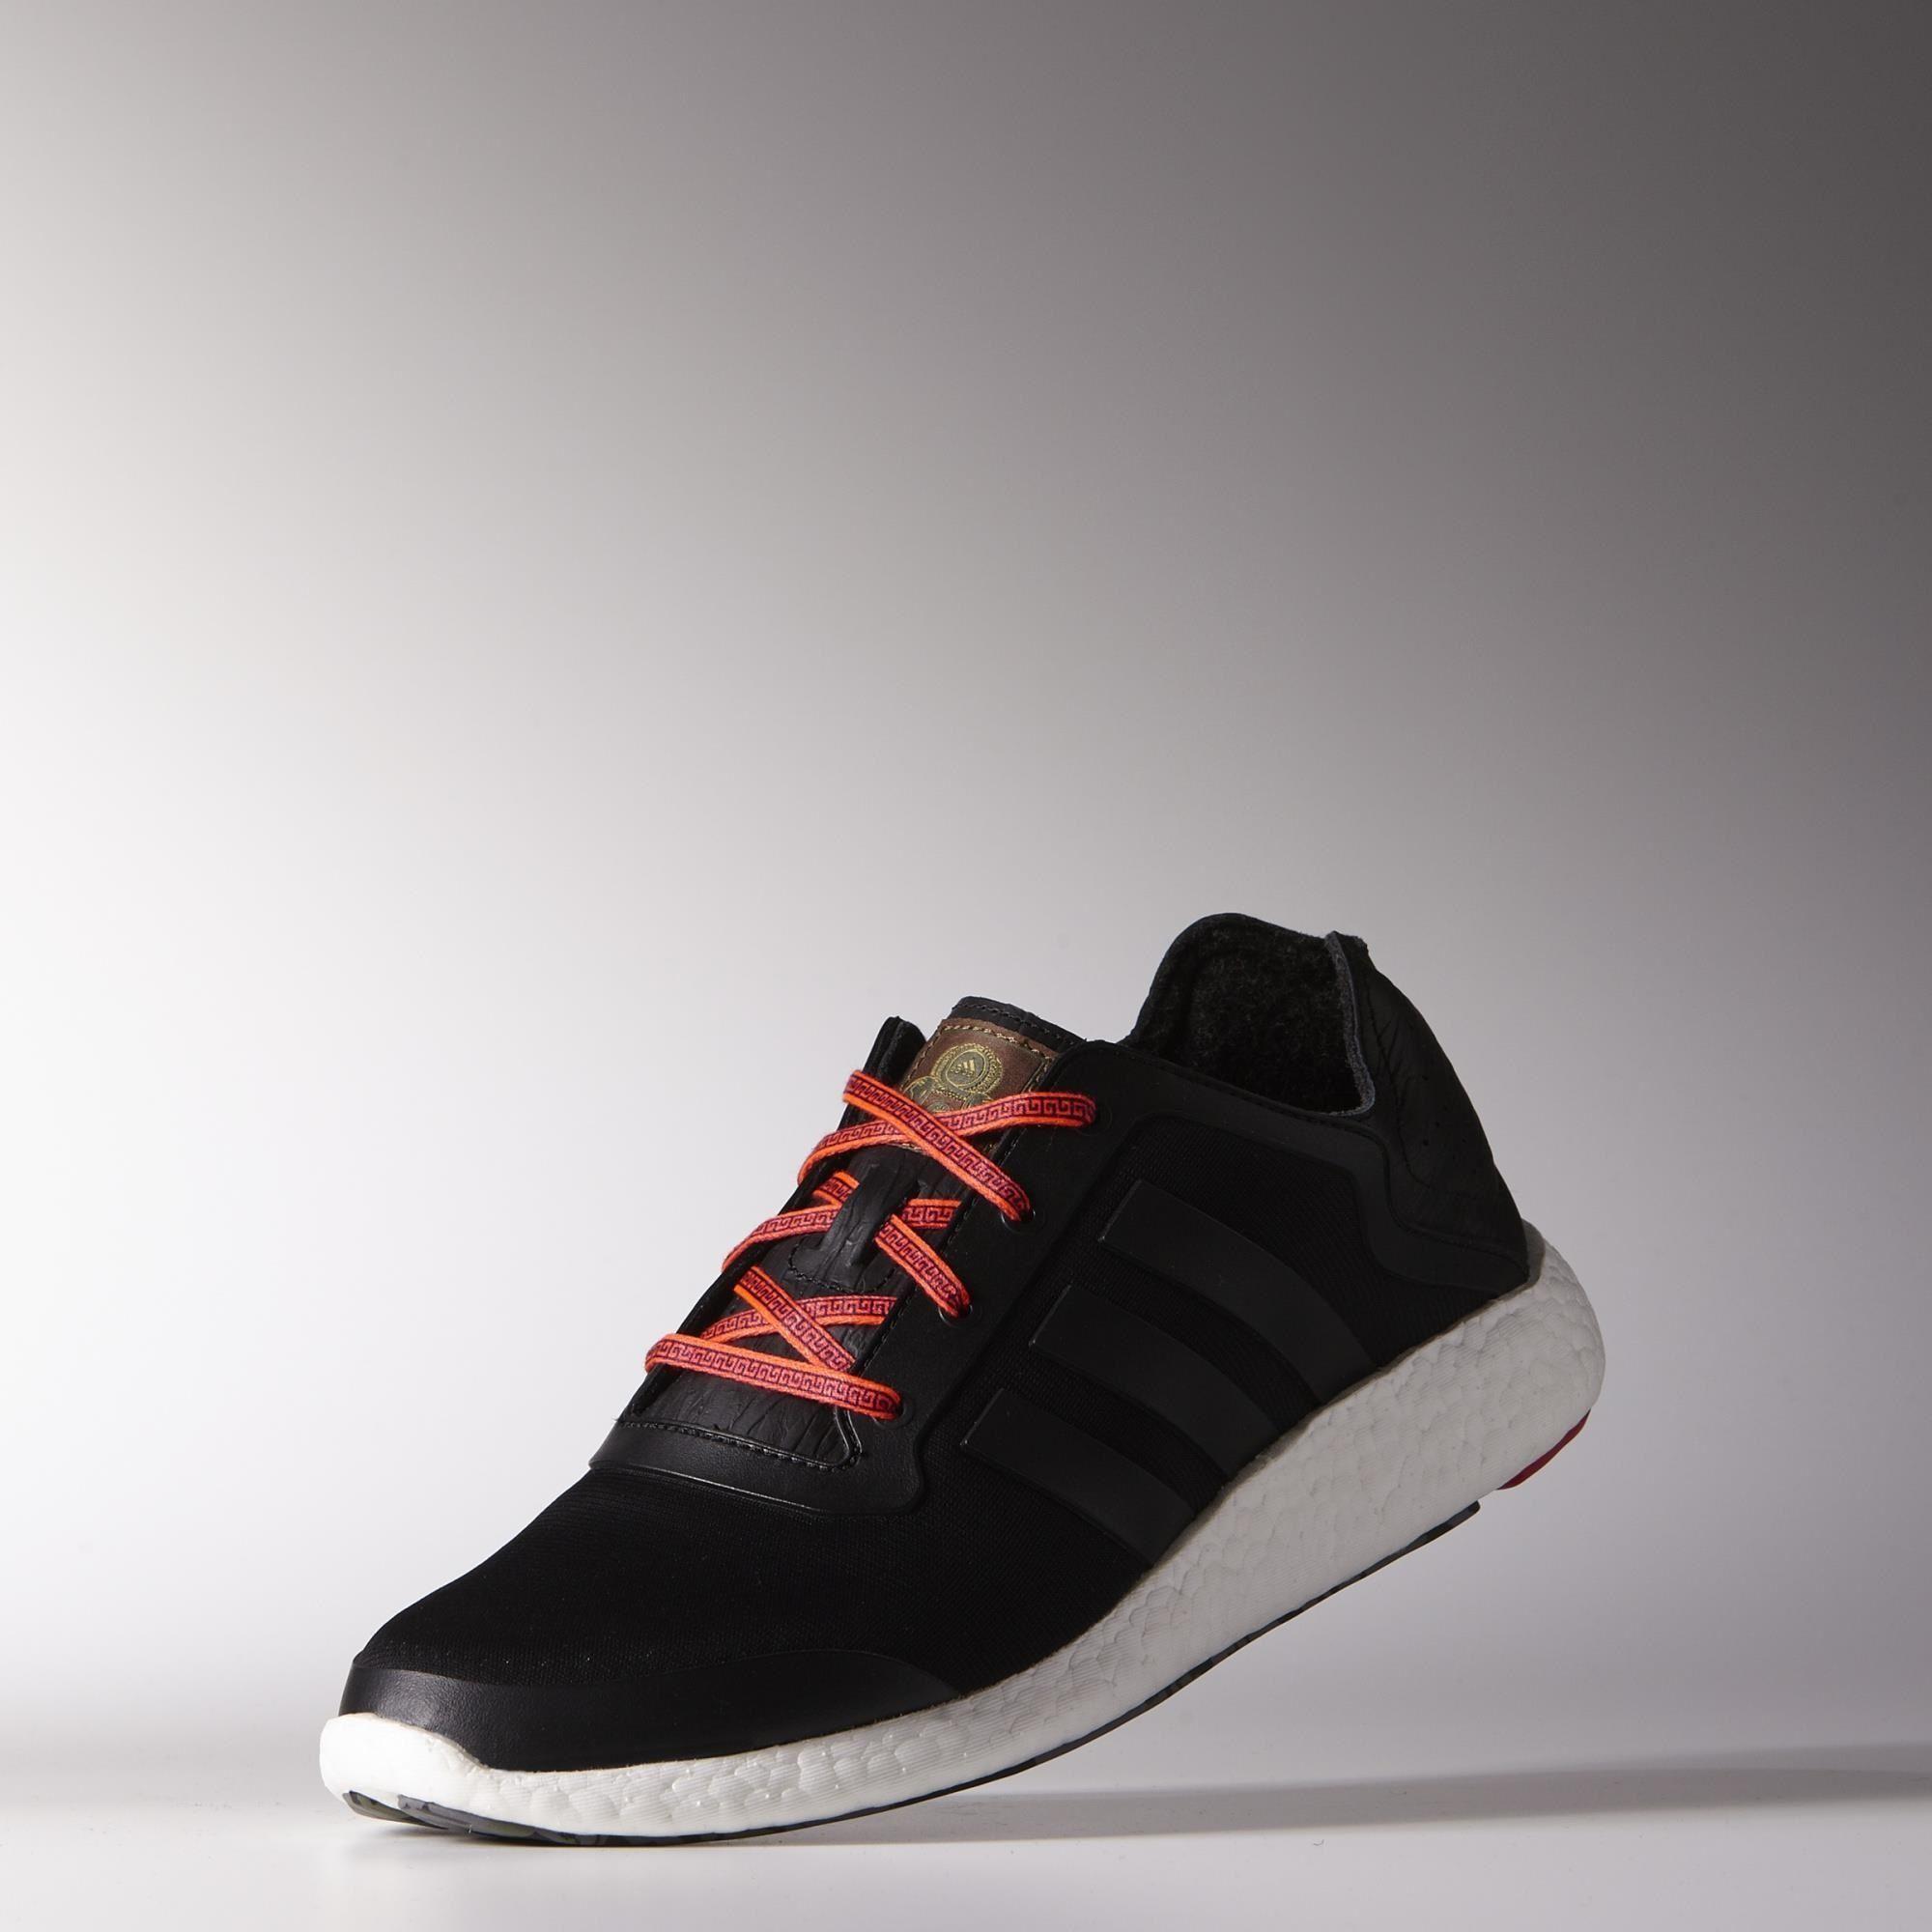 54e04bd64f1 adidas - Pure Boost Shoes Core Black B32699